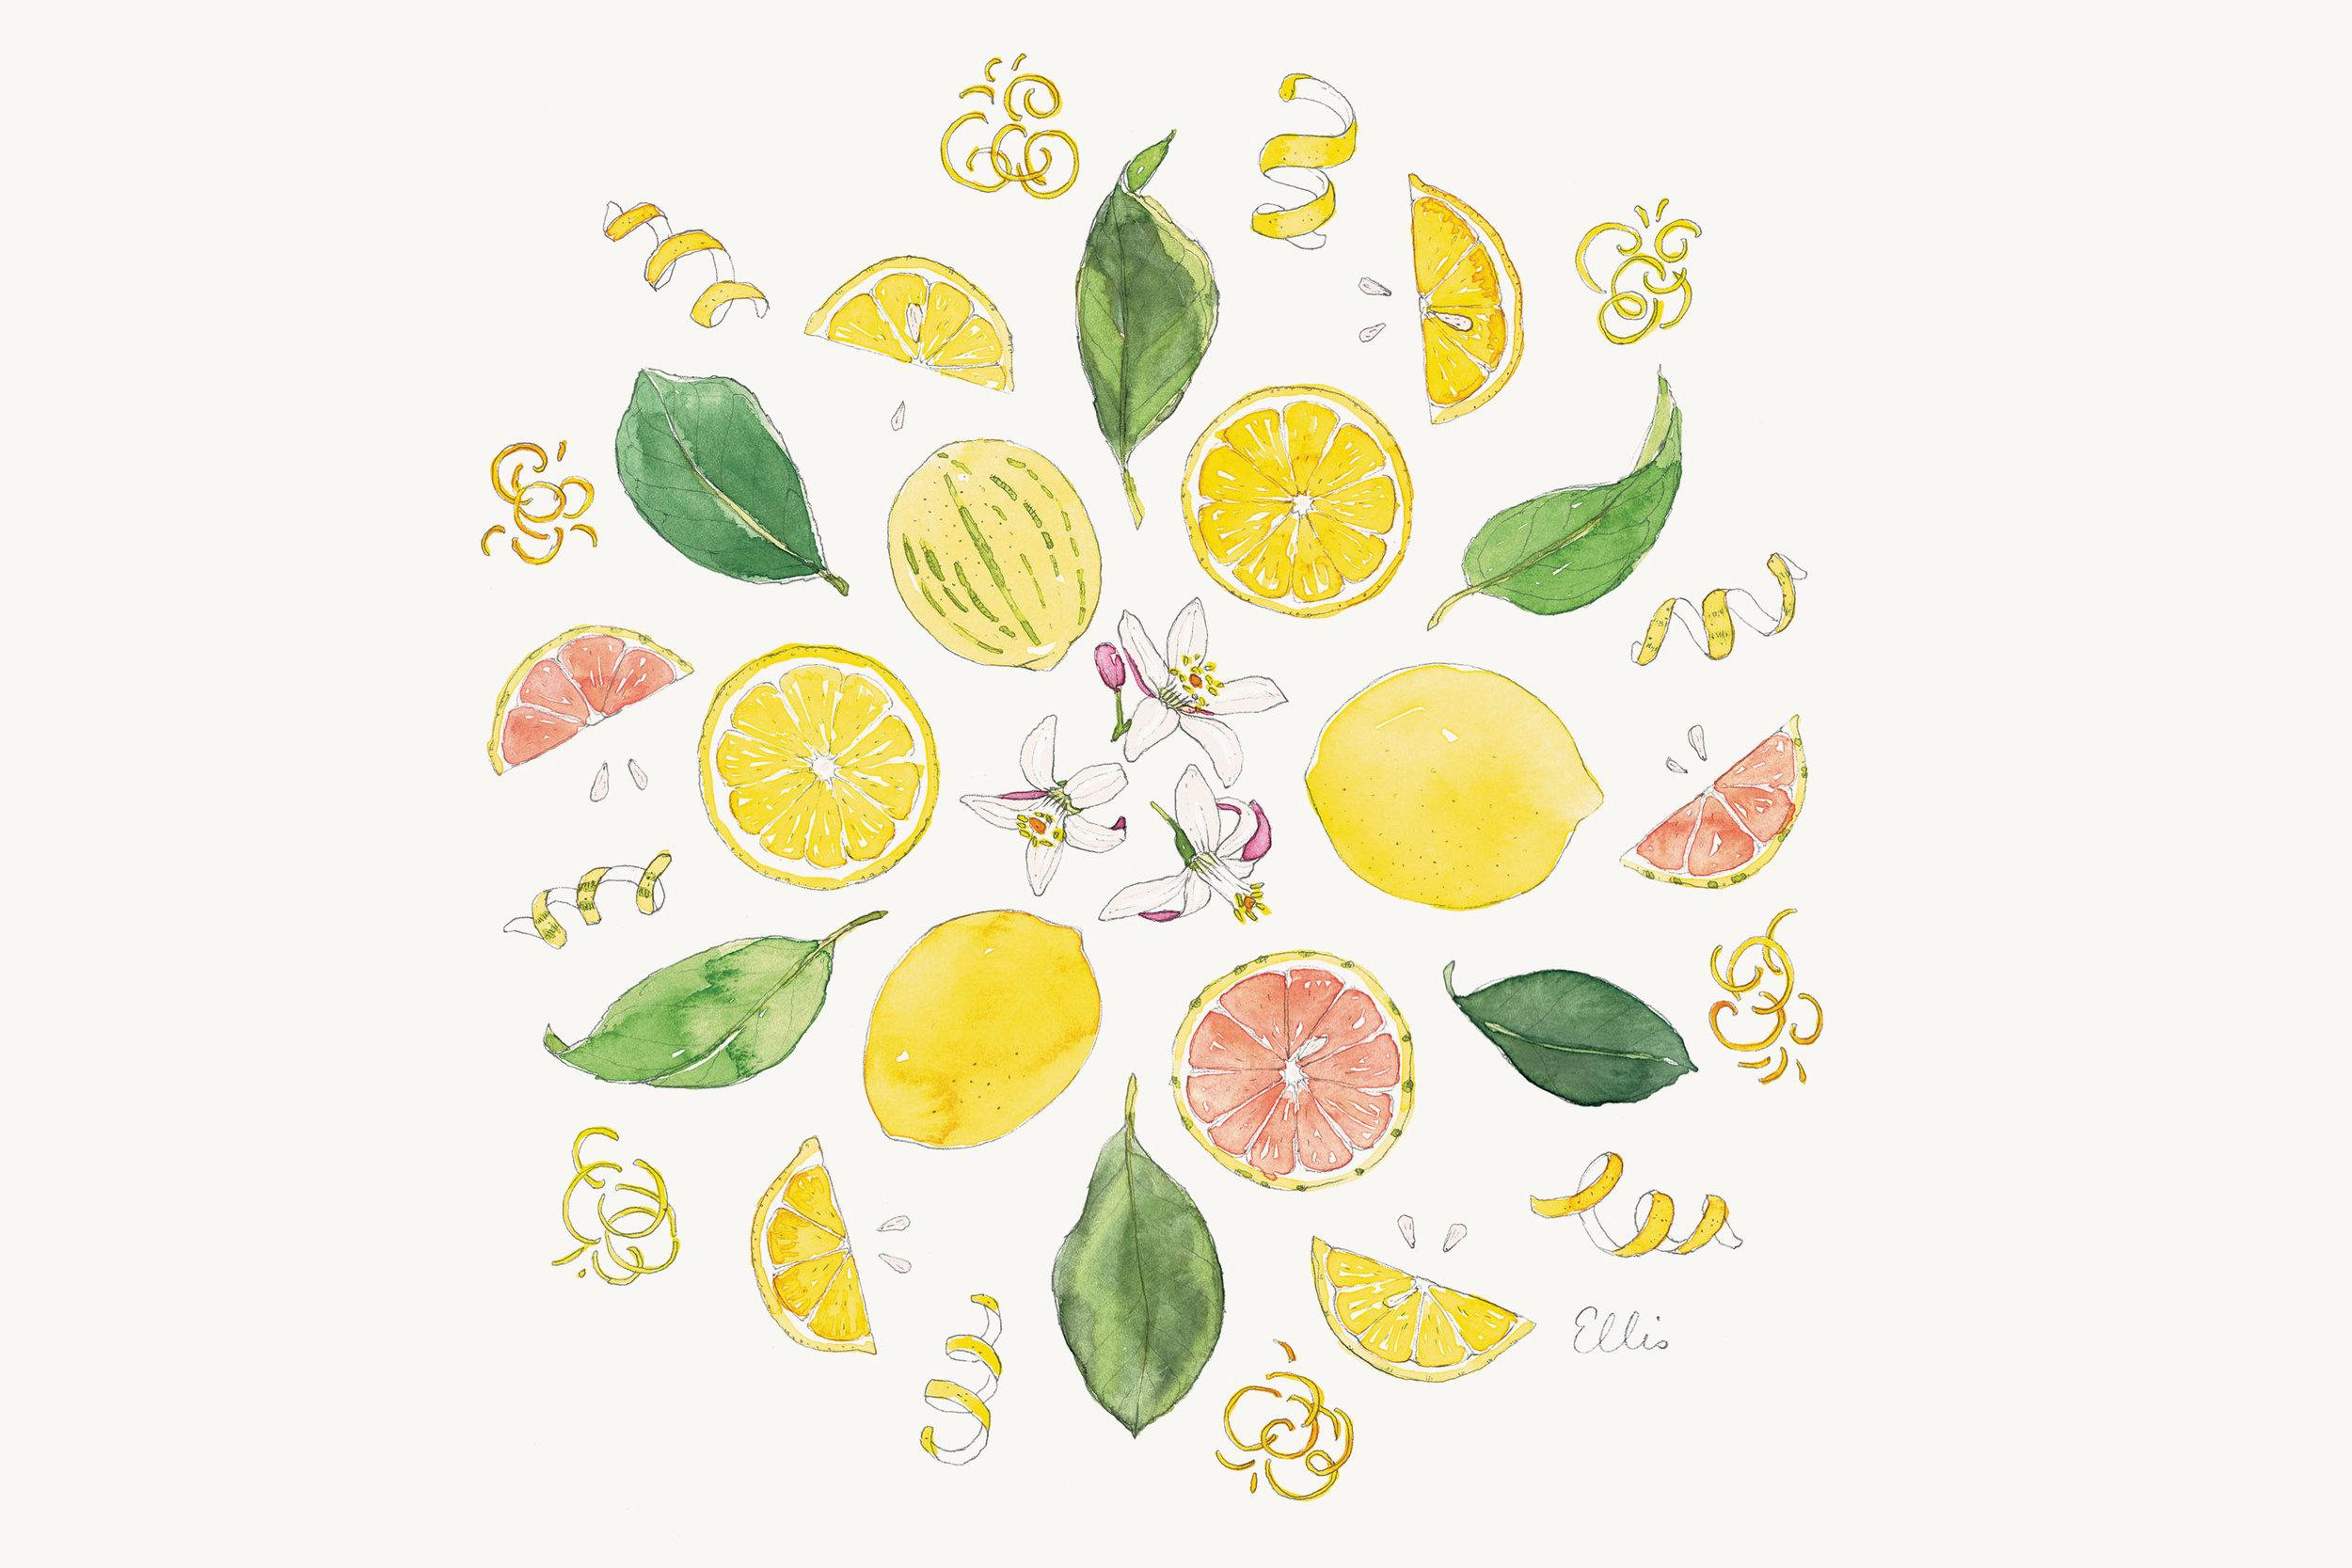 Lemons-mandala-illustration-by-Erin-Ellis---Tampa-Bay-Times-Taste.jpg